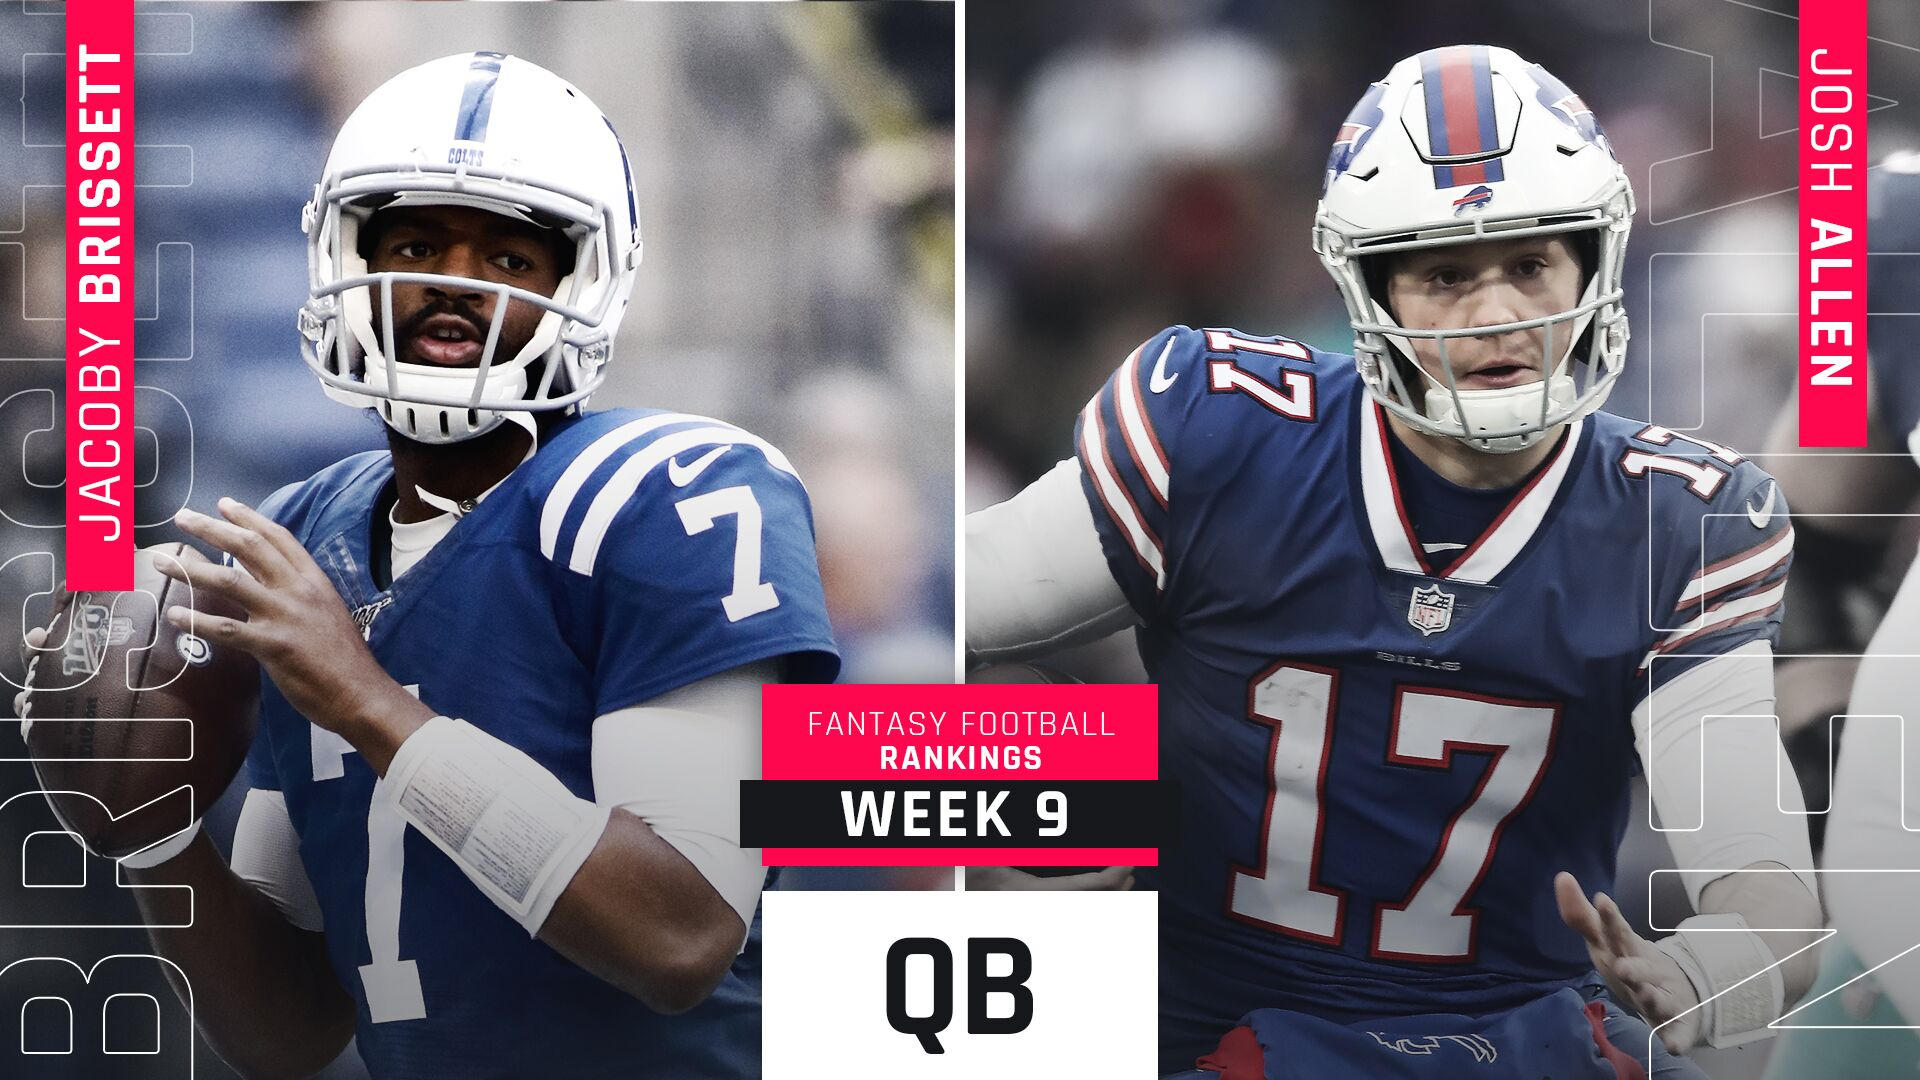 Week 9 Fantasy QB Rankings: Should you start or sit Lamar Jackson?